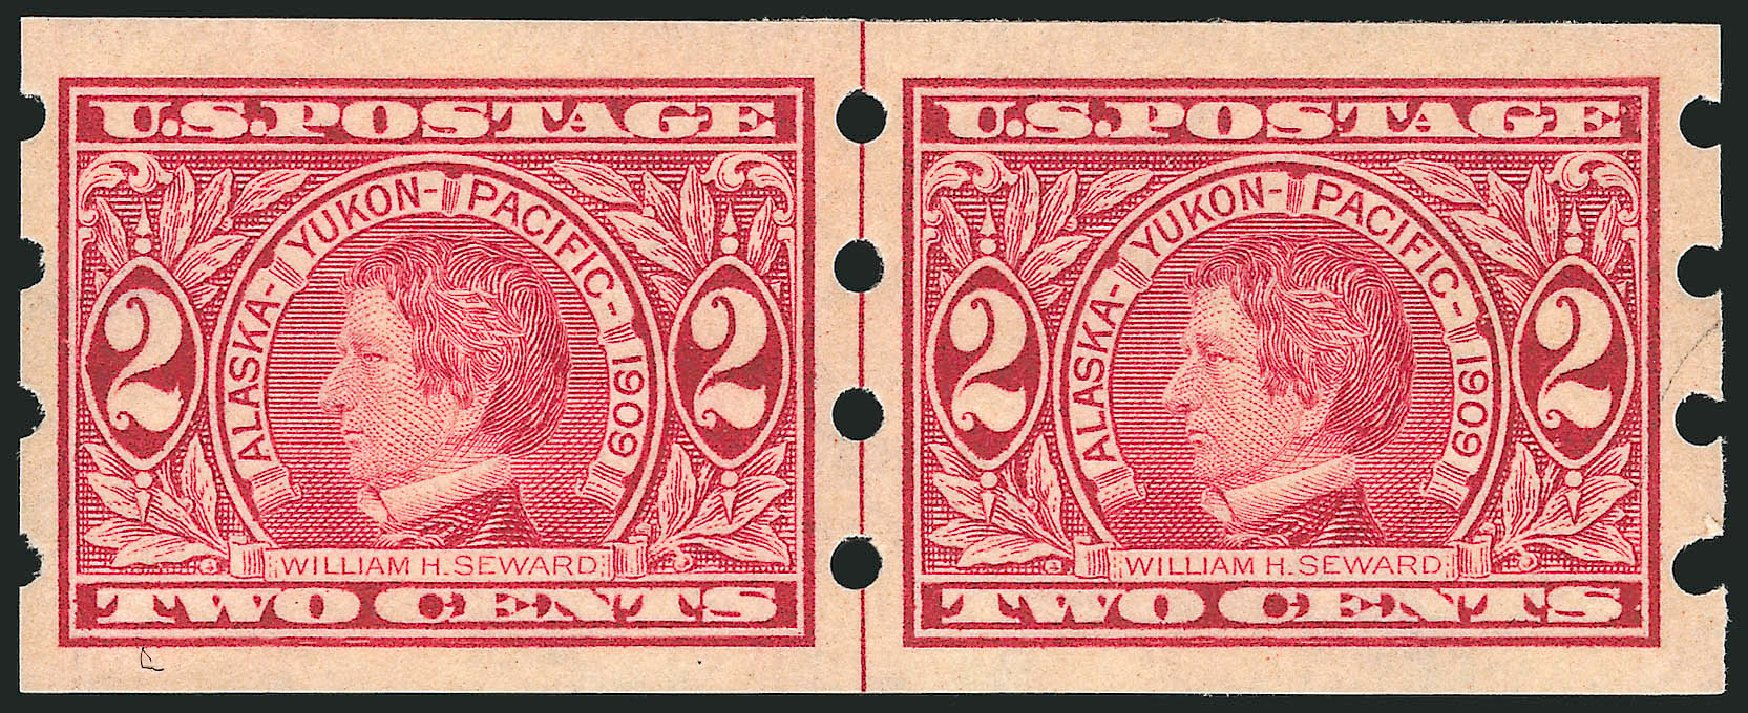 US Stamp Prices Scott #371 - 1909 2c Alaska-Yukon Exposition Imperf. Robert Siegel Auction Galleries, Oct 2014, Sale 1082, Lot 446